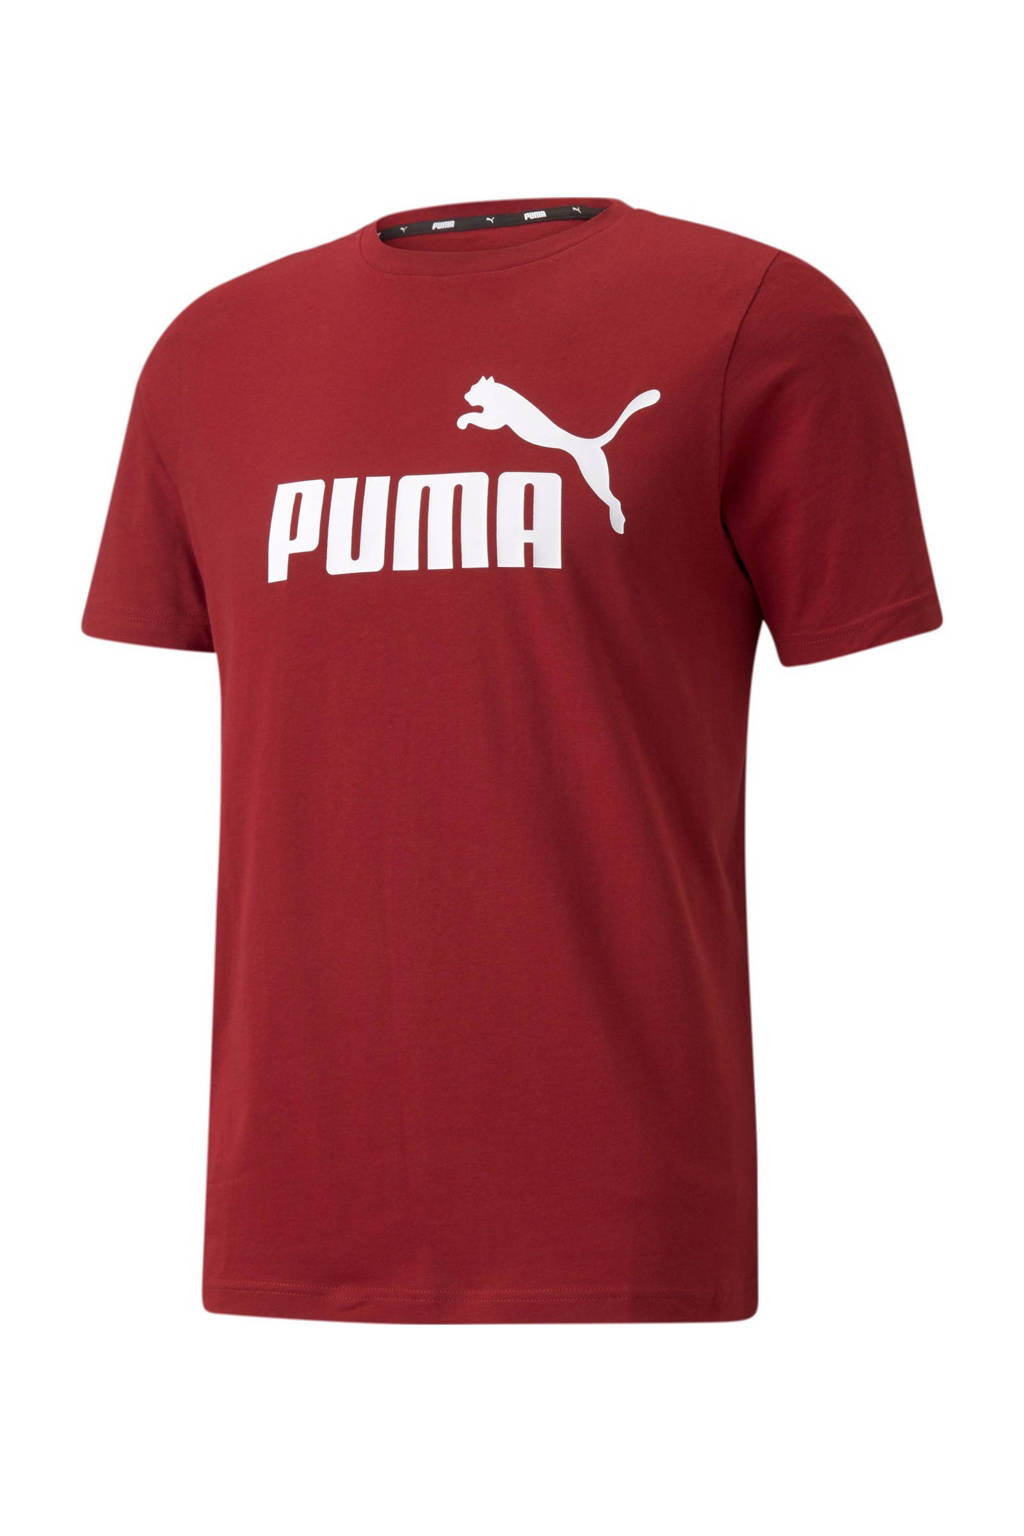 Puma T-shirt rood, Rood